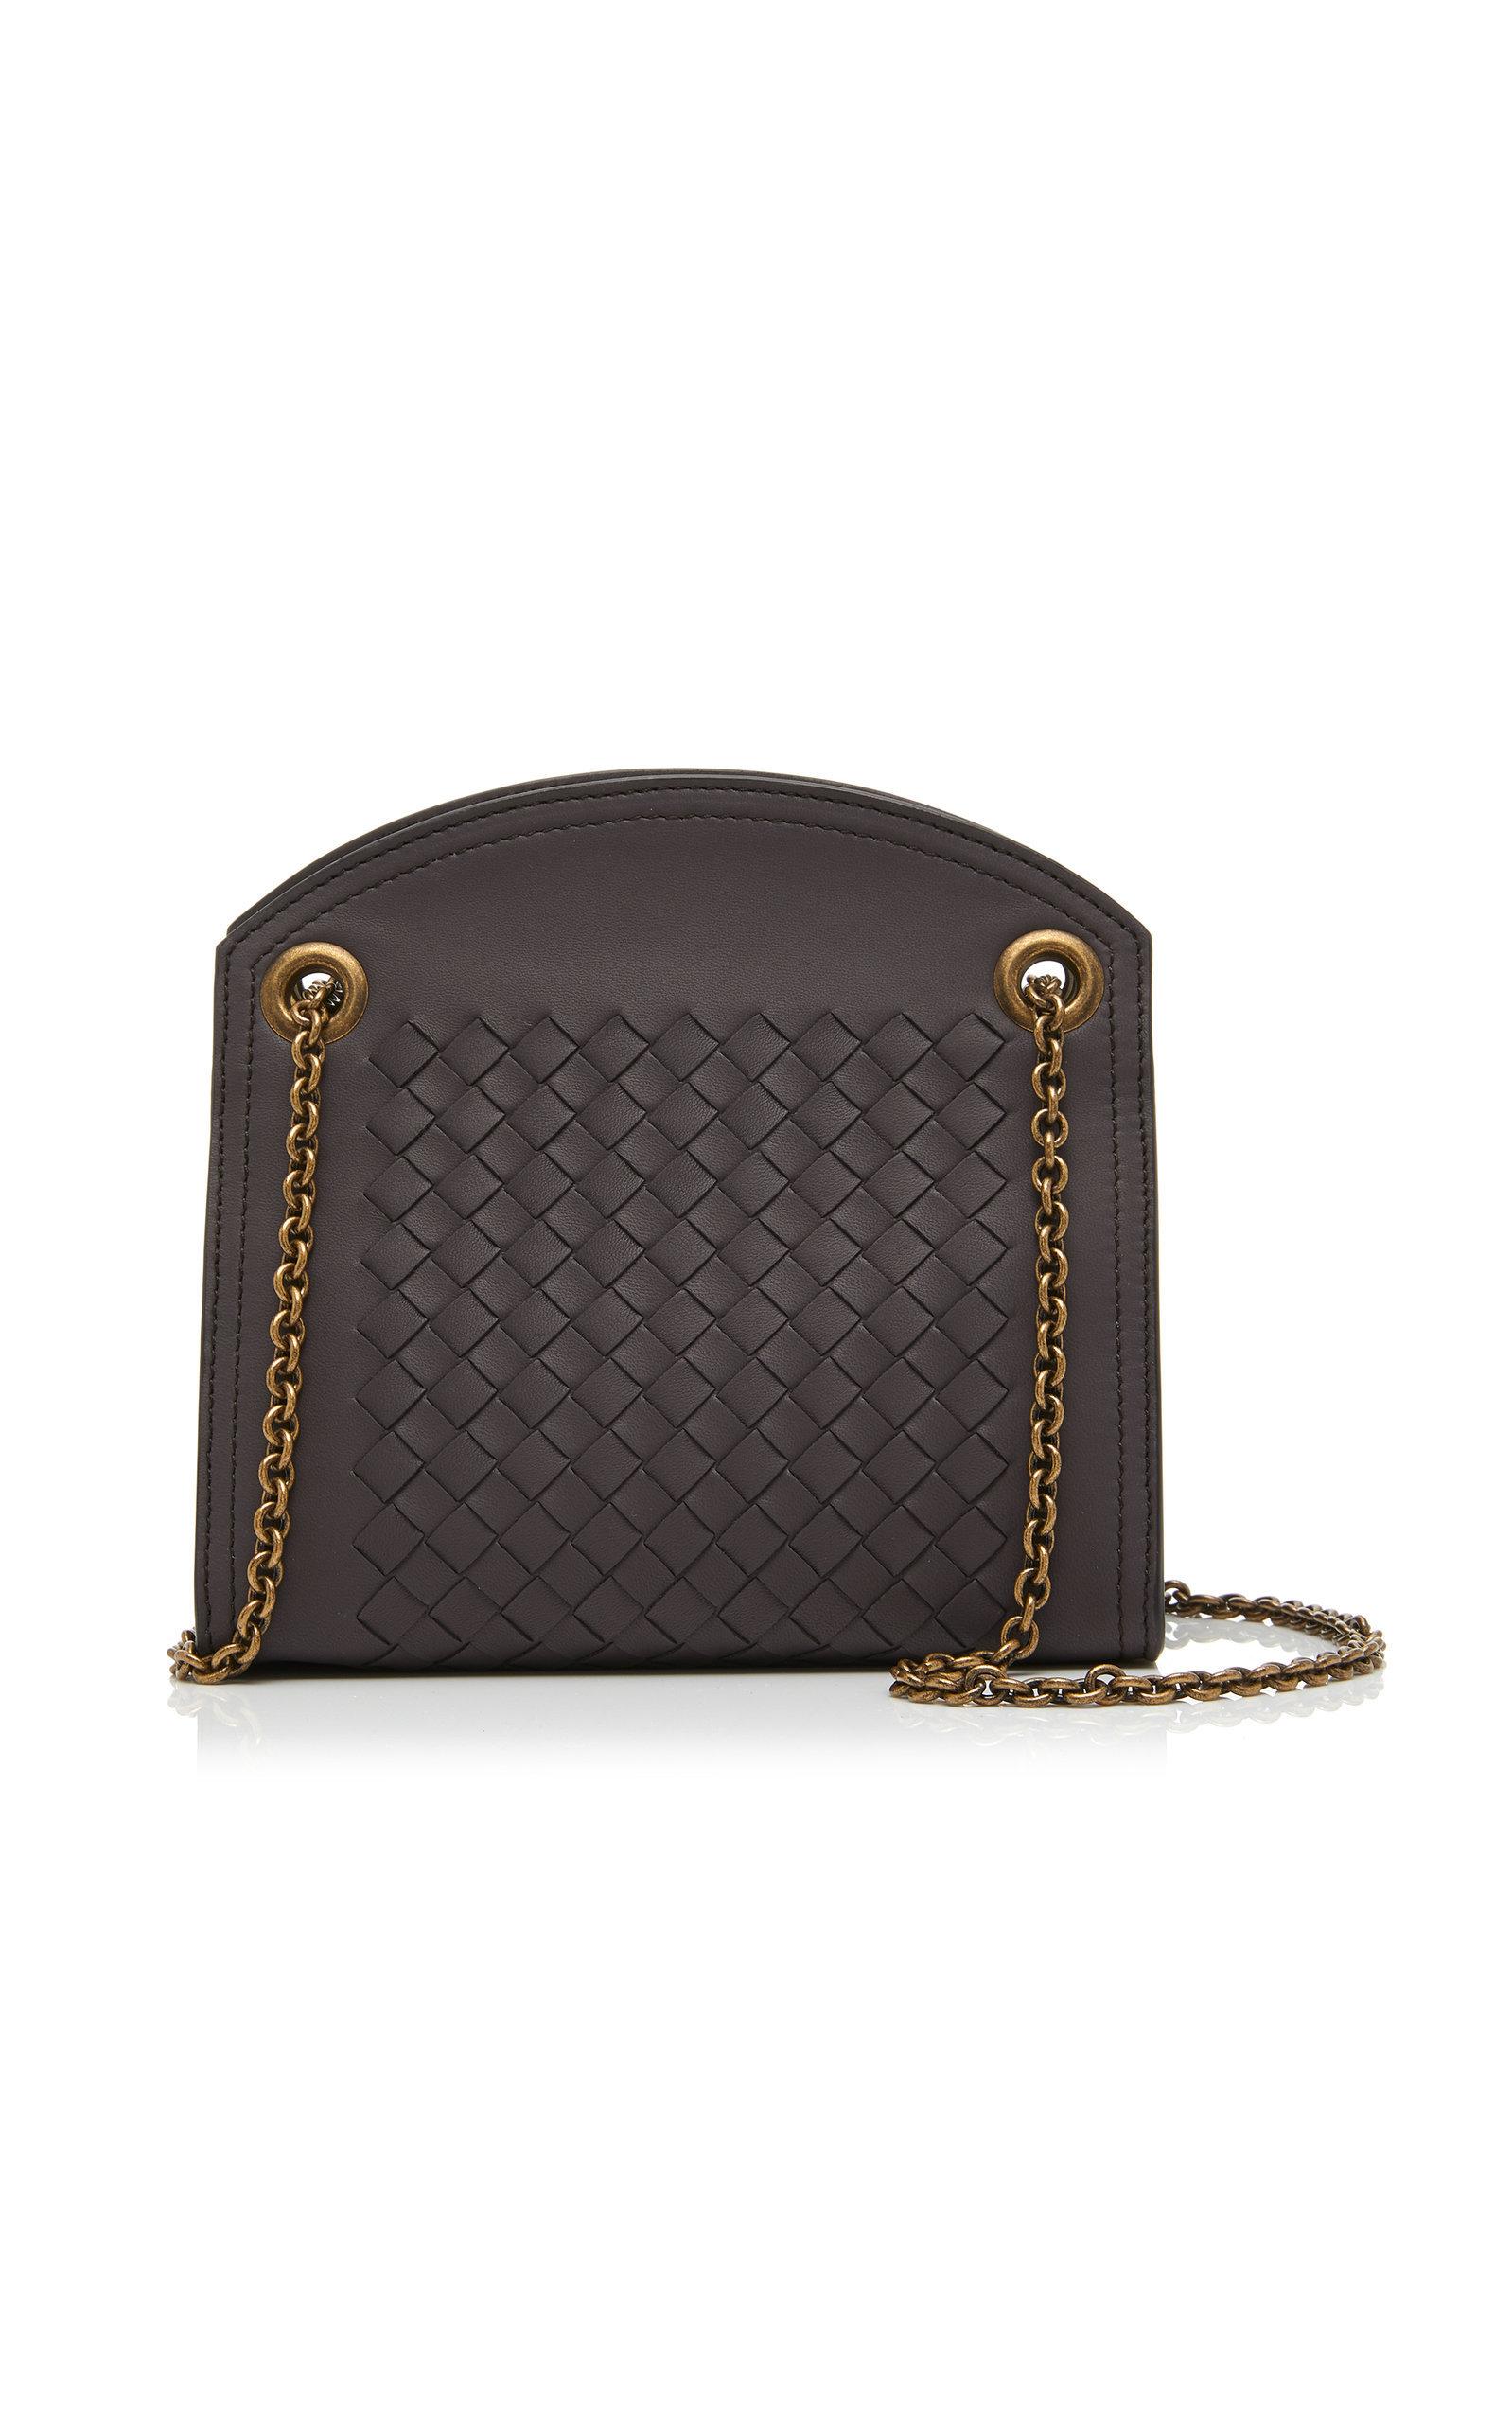 abbea8599 Bottega Veneta Woven Leather Shoulder Bag In Brown | ModeSens